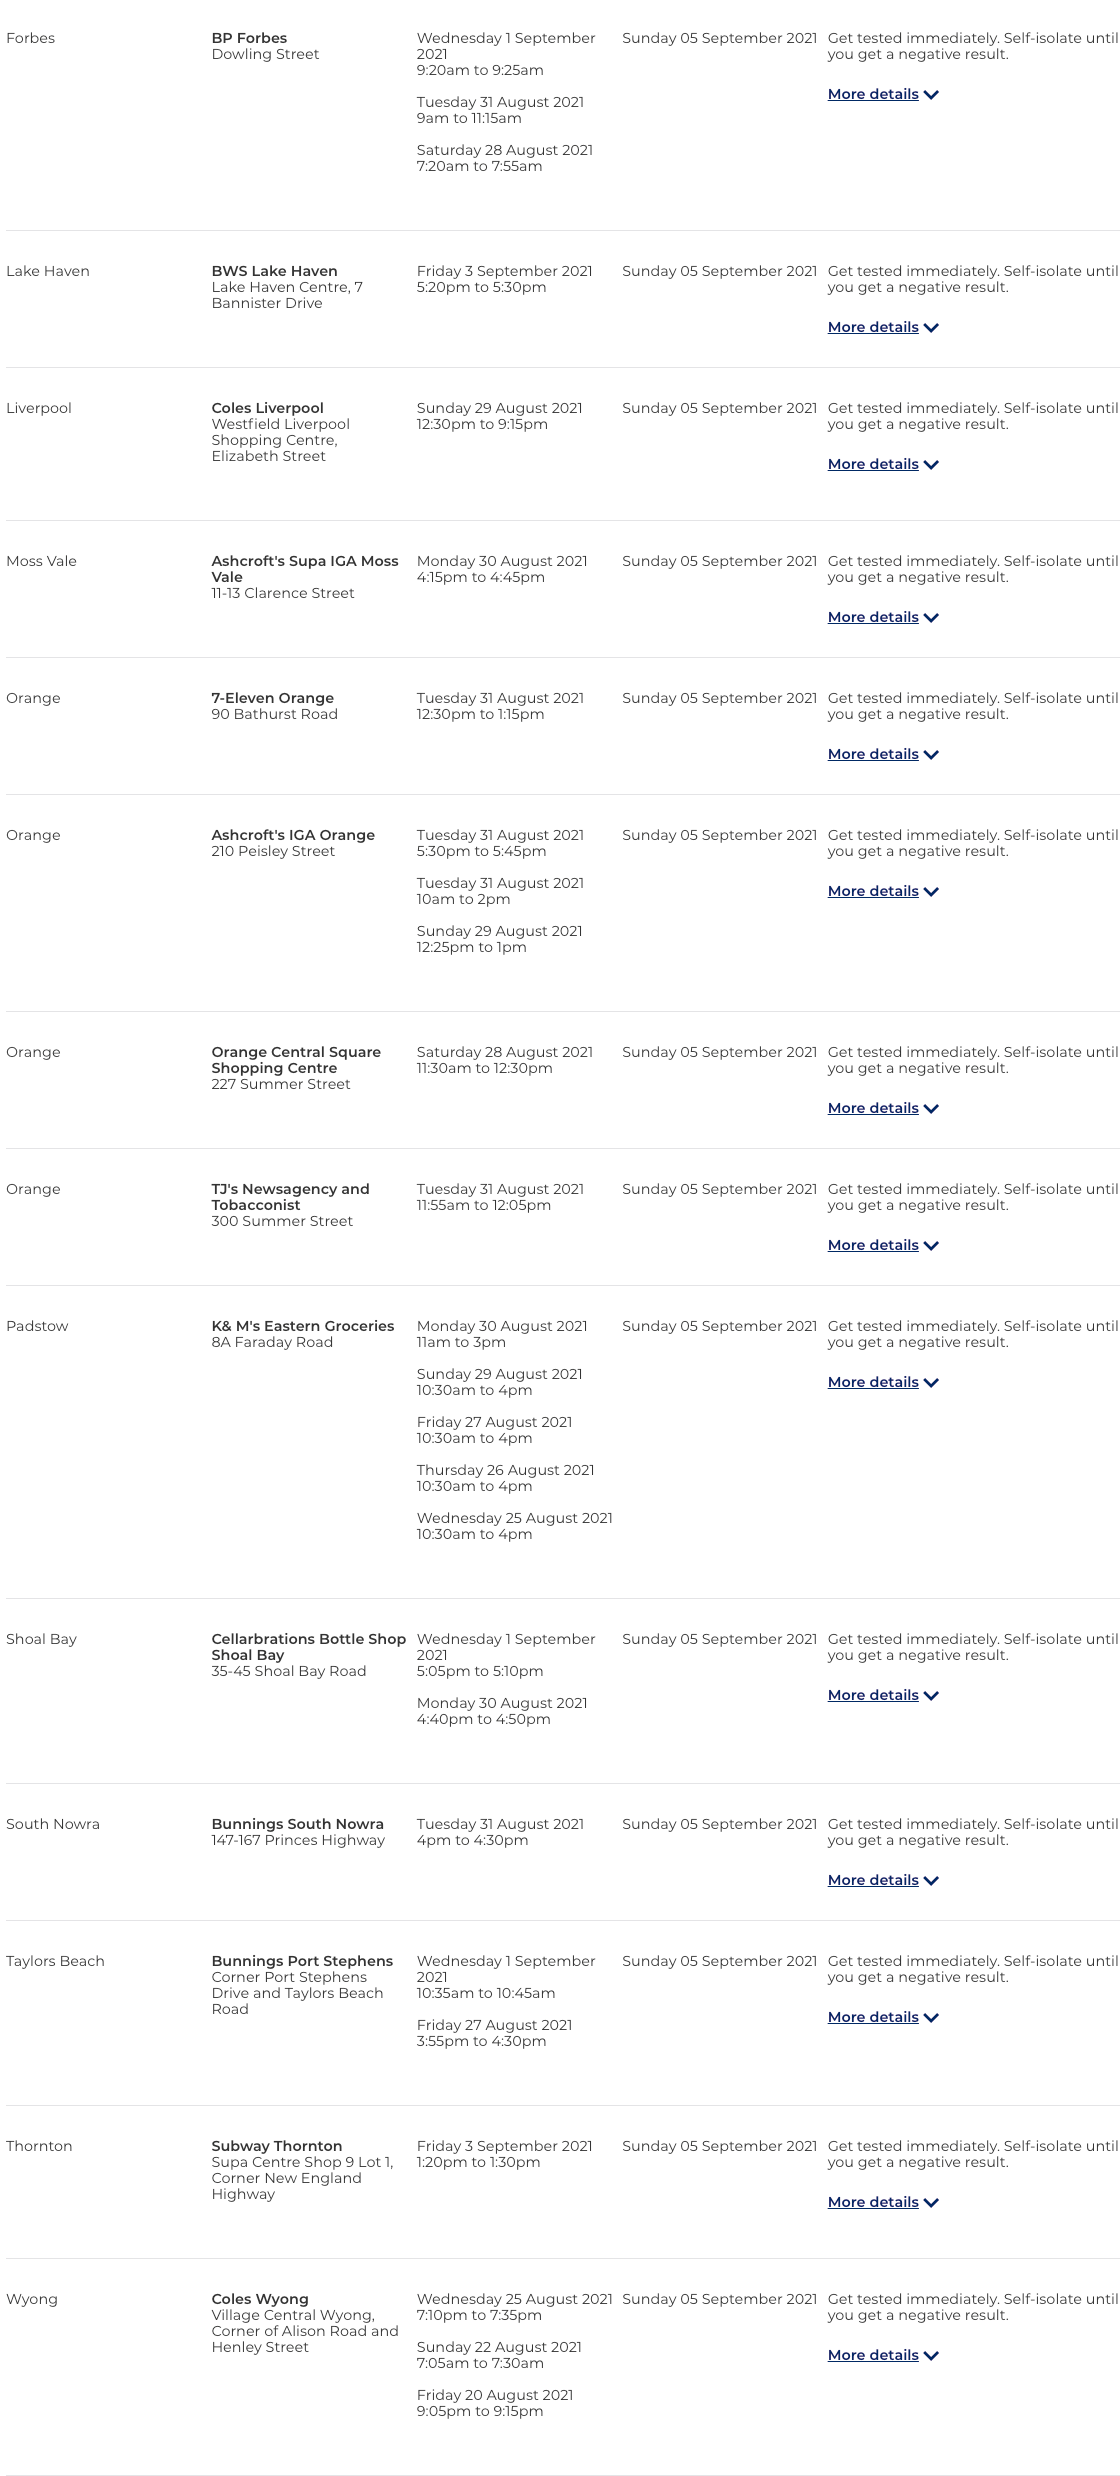 www.nsw.gov.au_covid-19_nsw-covid-19-case-locations_case-locations (13).png